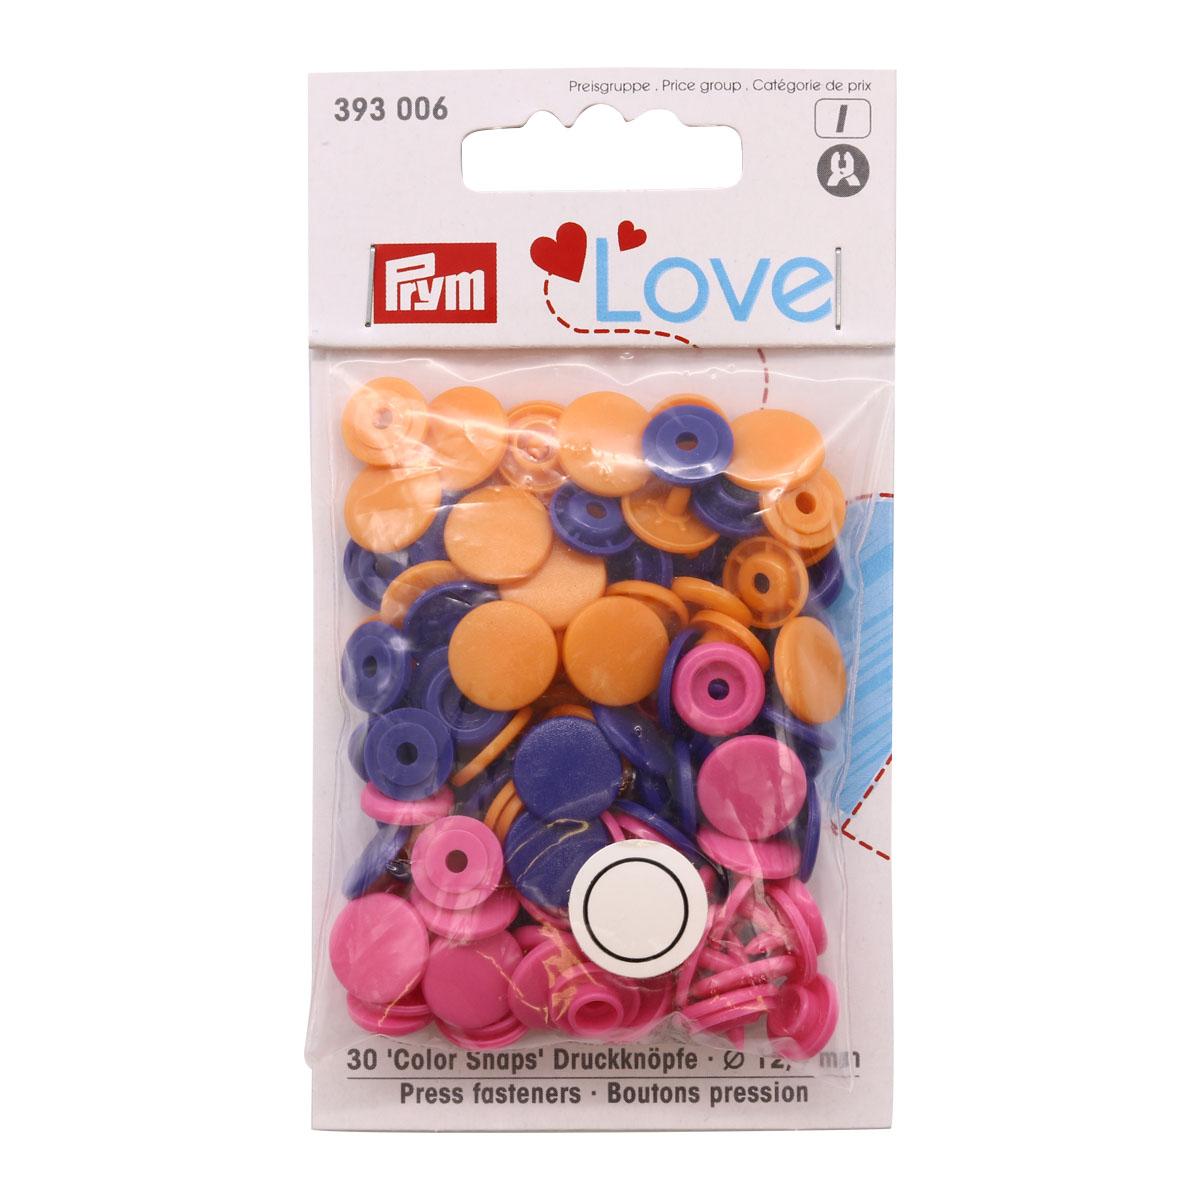 393006 Kнопки Color Snaps PrymLove, оранж./розовый/фиол цв., 12мм, 30шт Prym